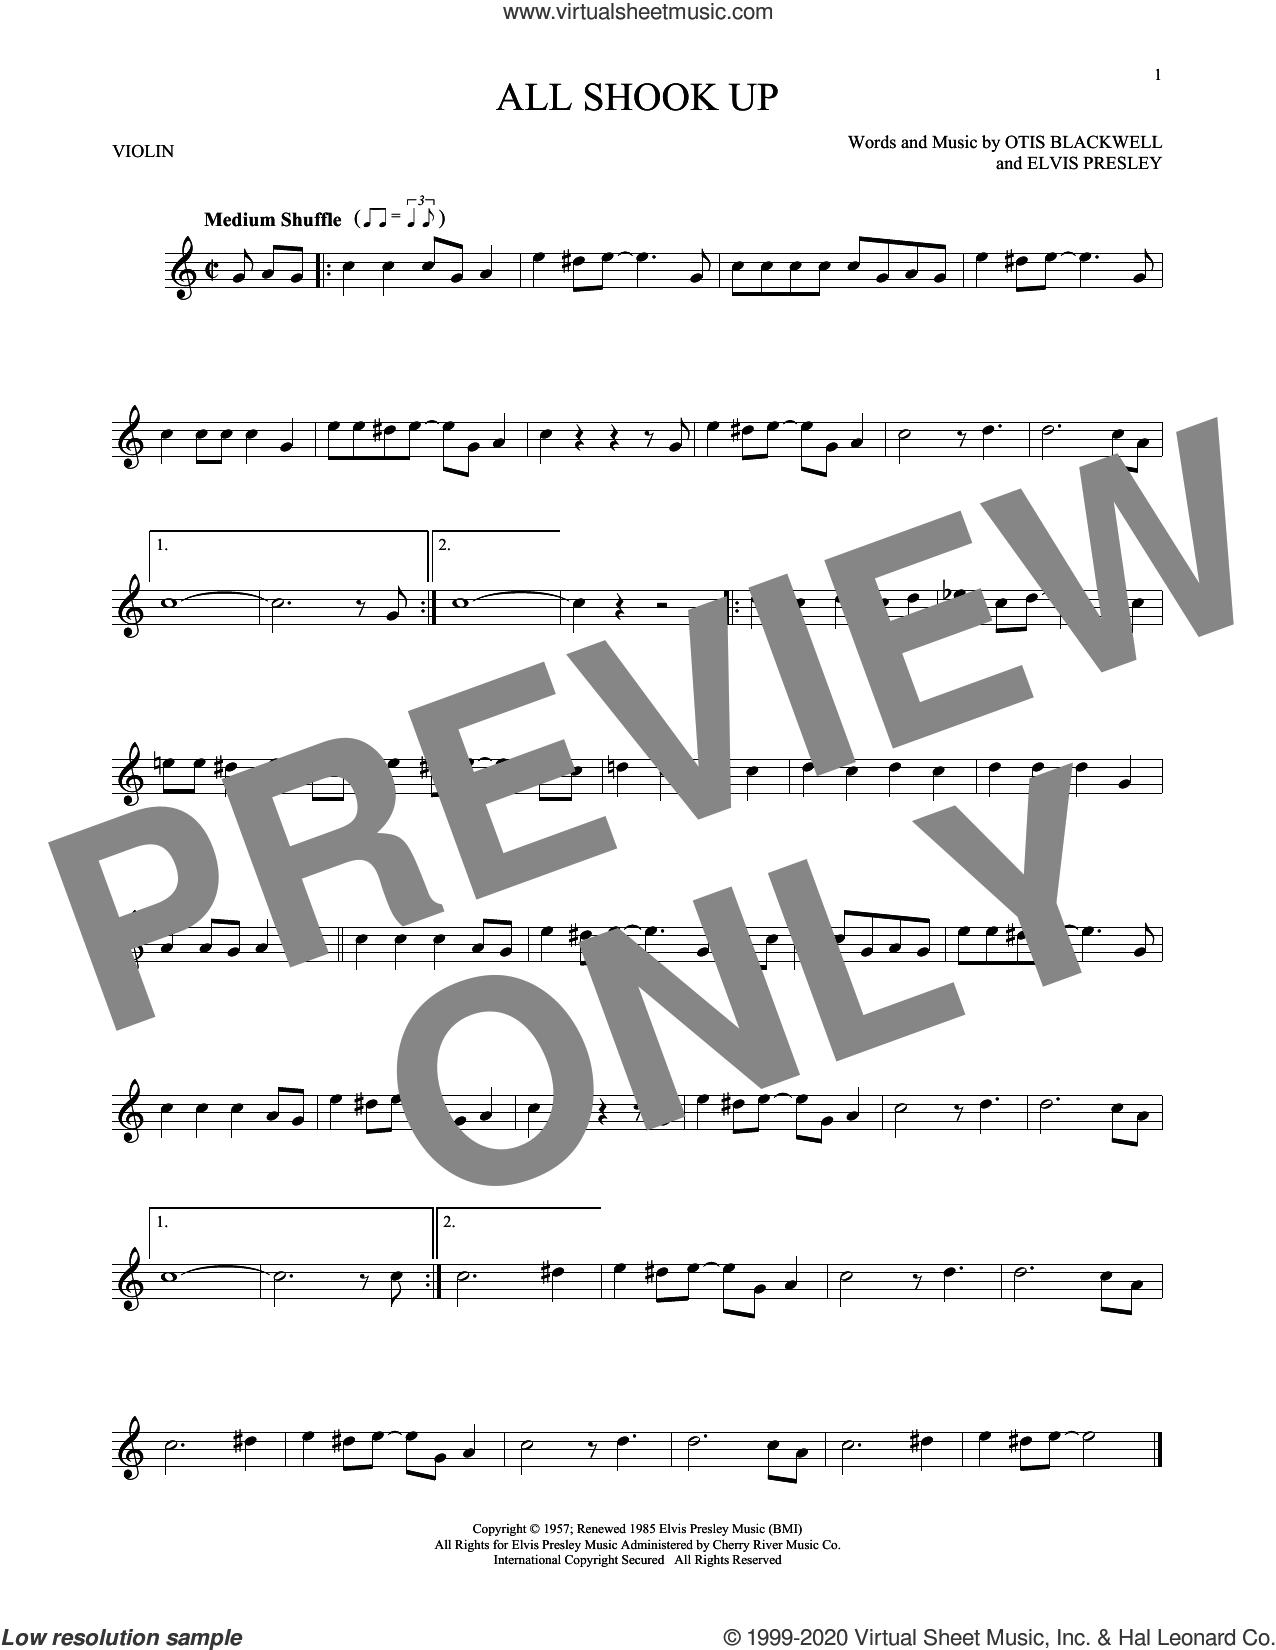 All Shook Up sheet music for violin solo by Elvis Presley, Suzi Quatro and Otis Blackwell, intermediate skill level